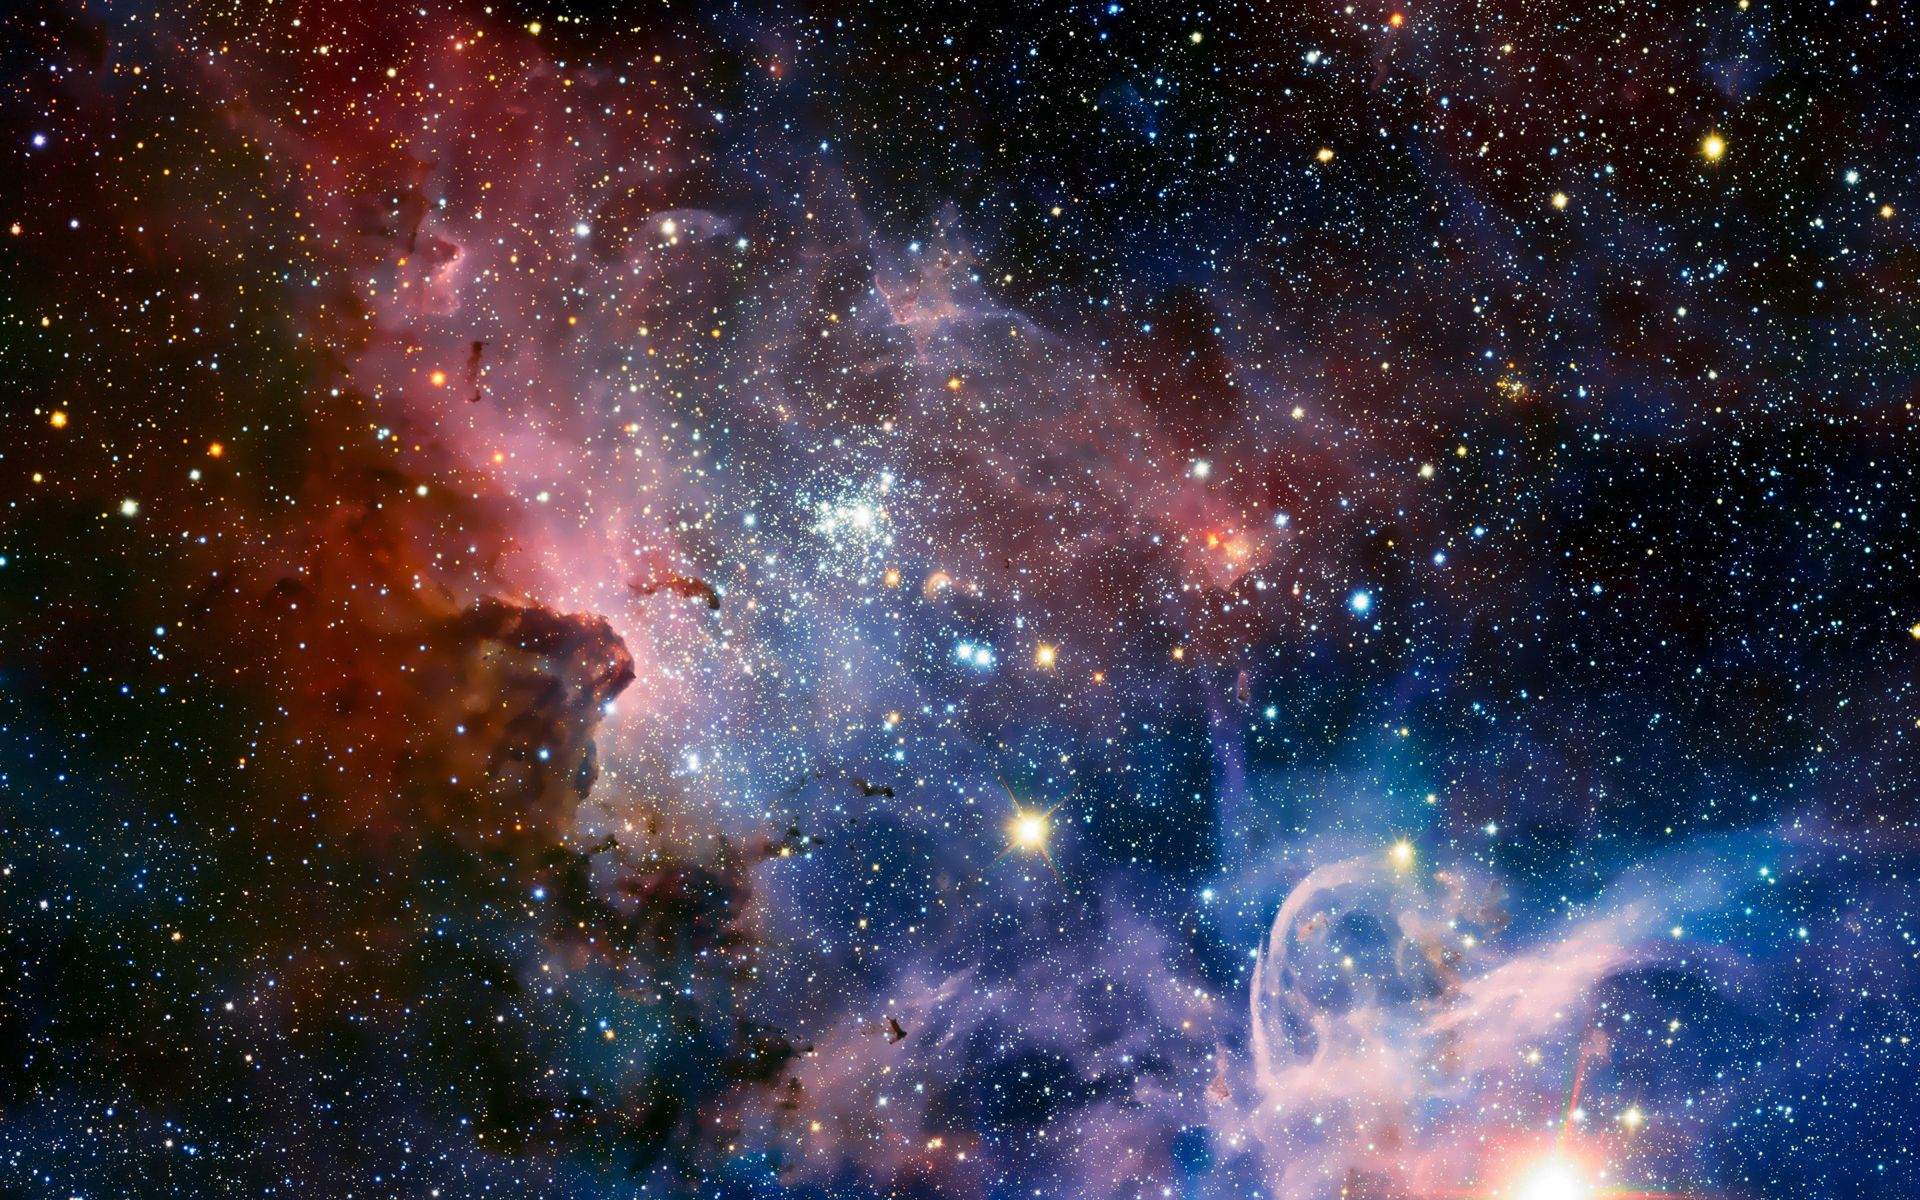 4k Space Wallpaper High Definition 6vjeq Arrigo Musti Pinterest